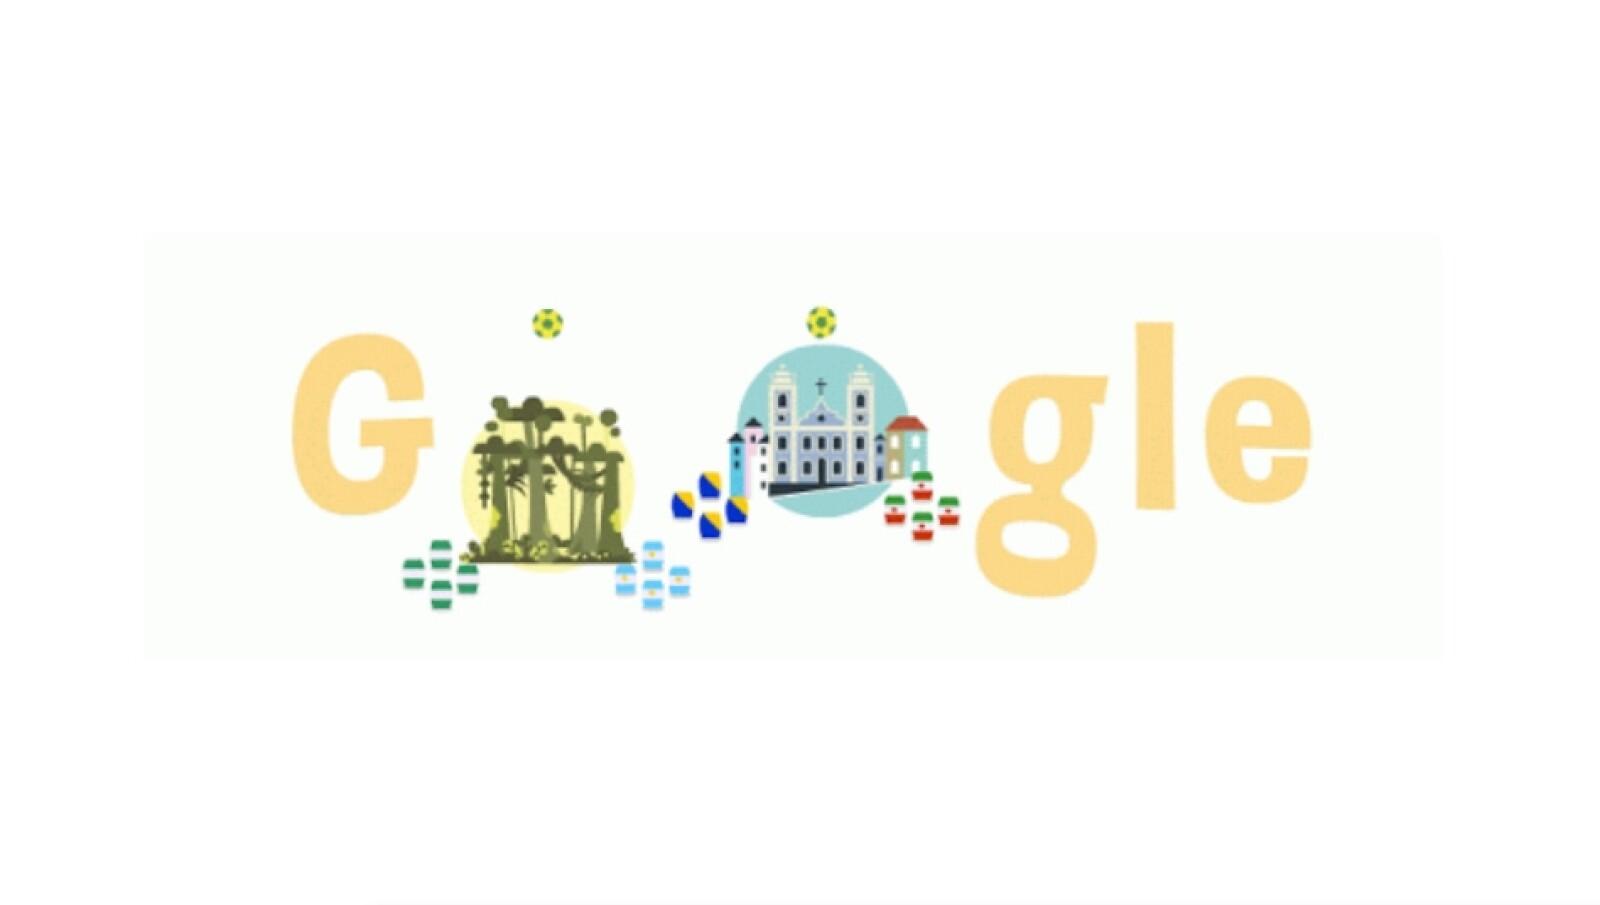 Google doodle 32 ok